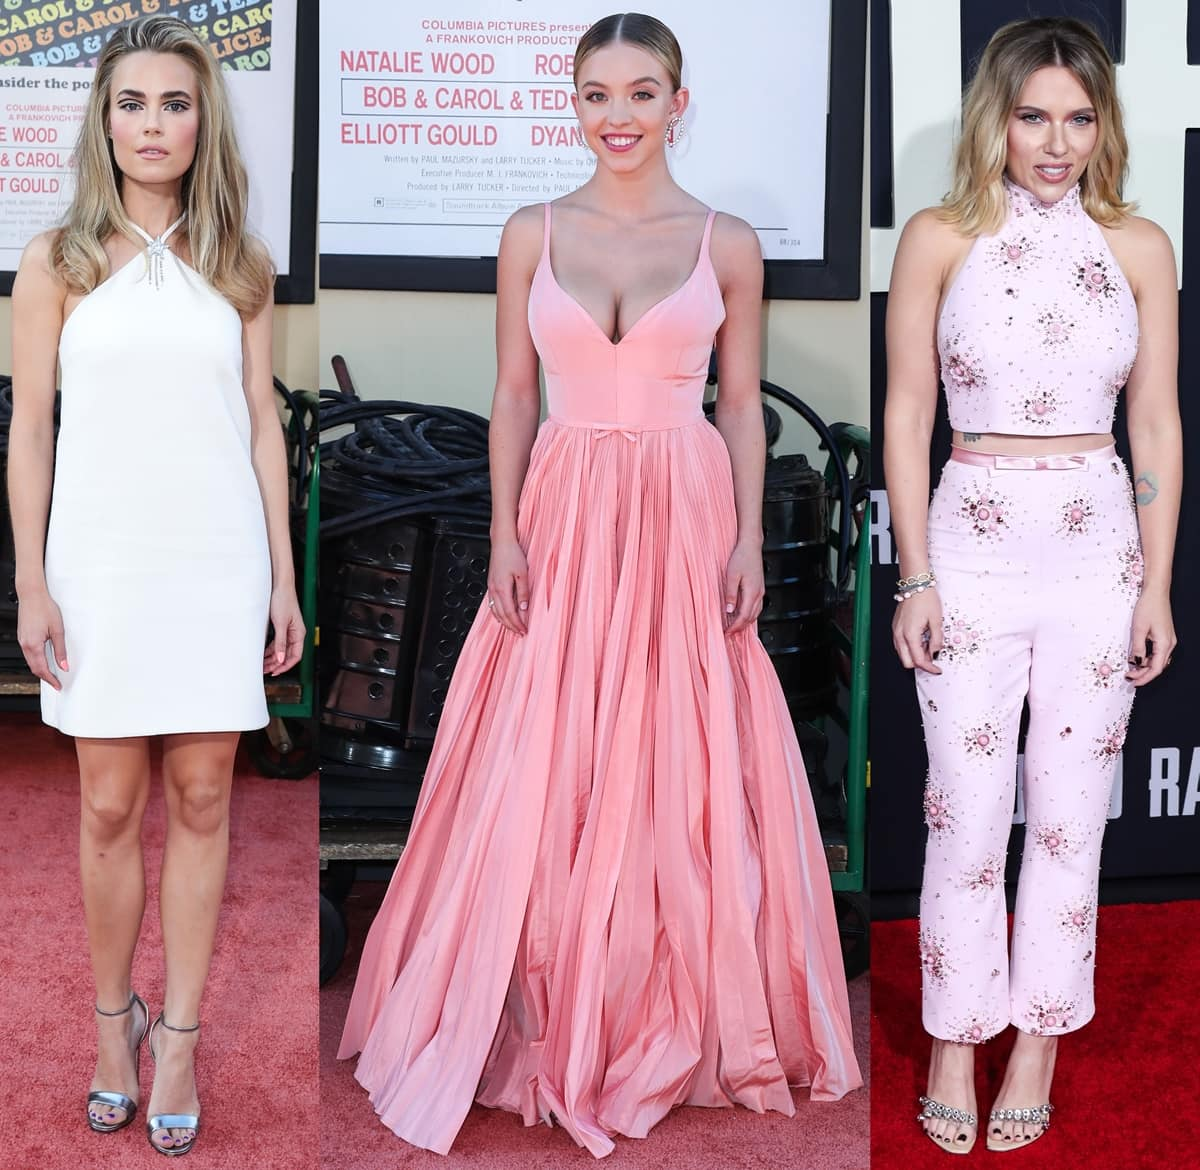 Rebecca Rittenhouse, Sydney Sweeney, and Scarlett Johansson wearing Miu Miu outfits